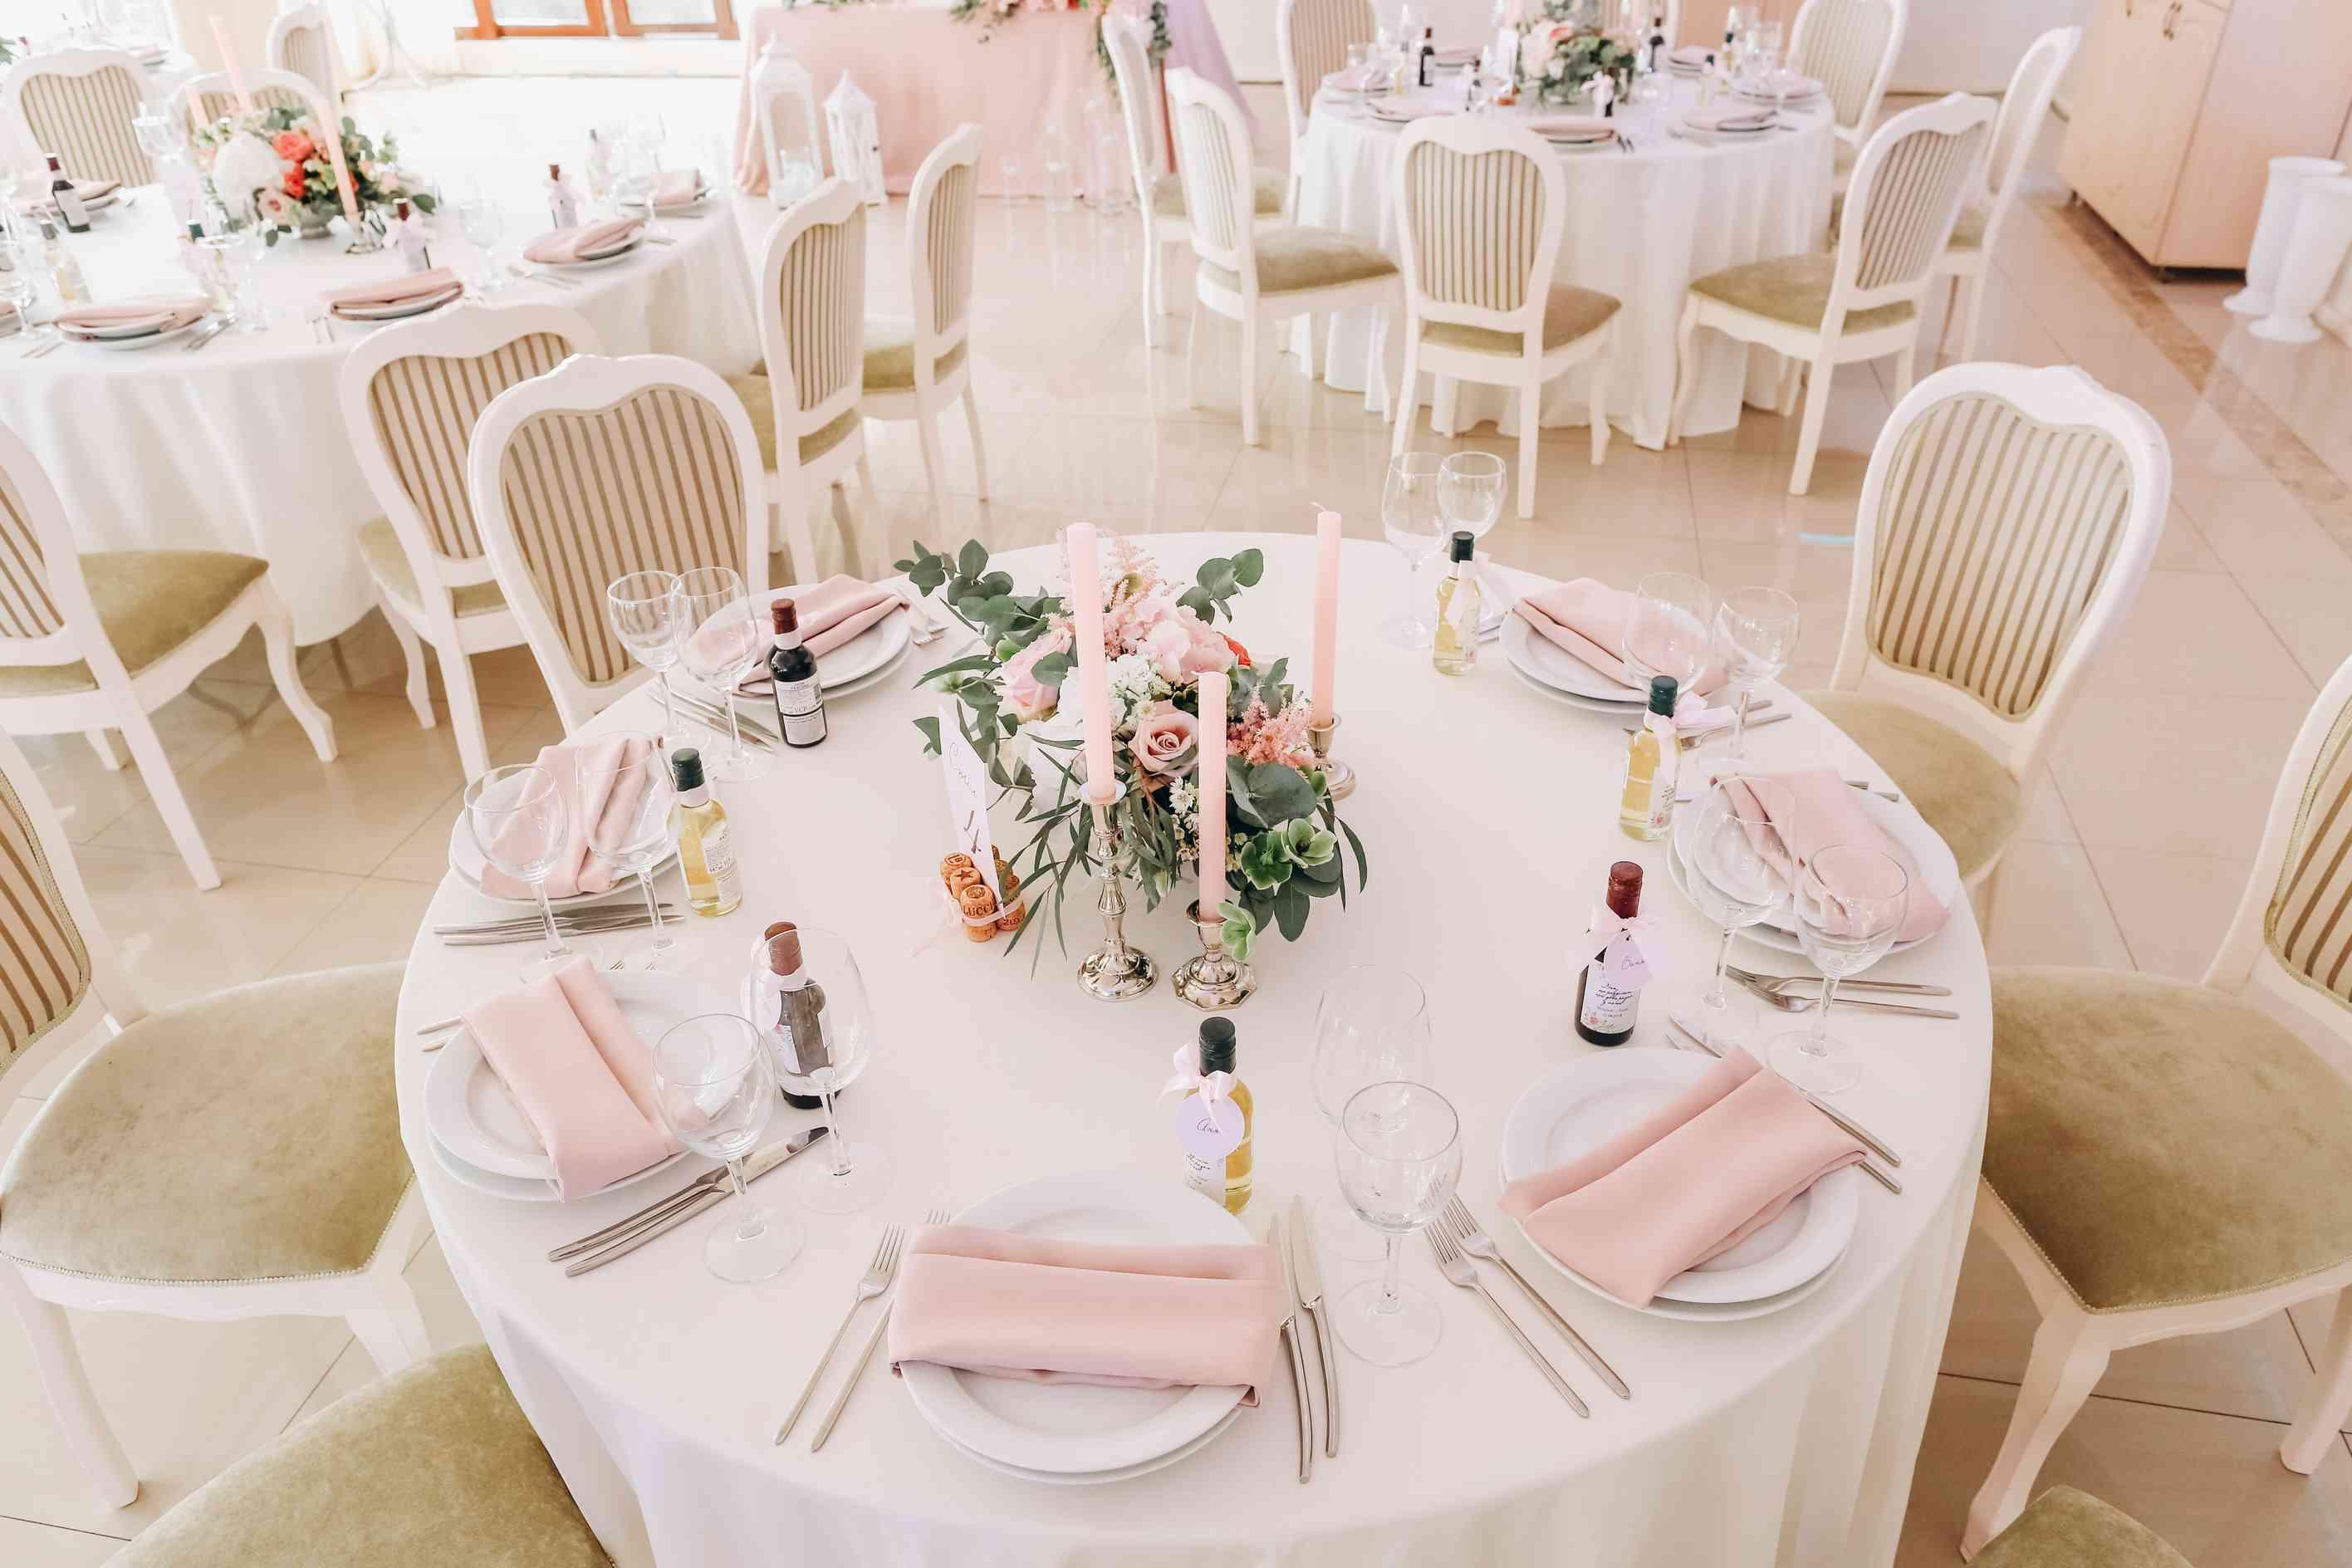 декор гостевого стола на свадьбе